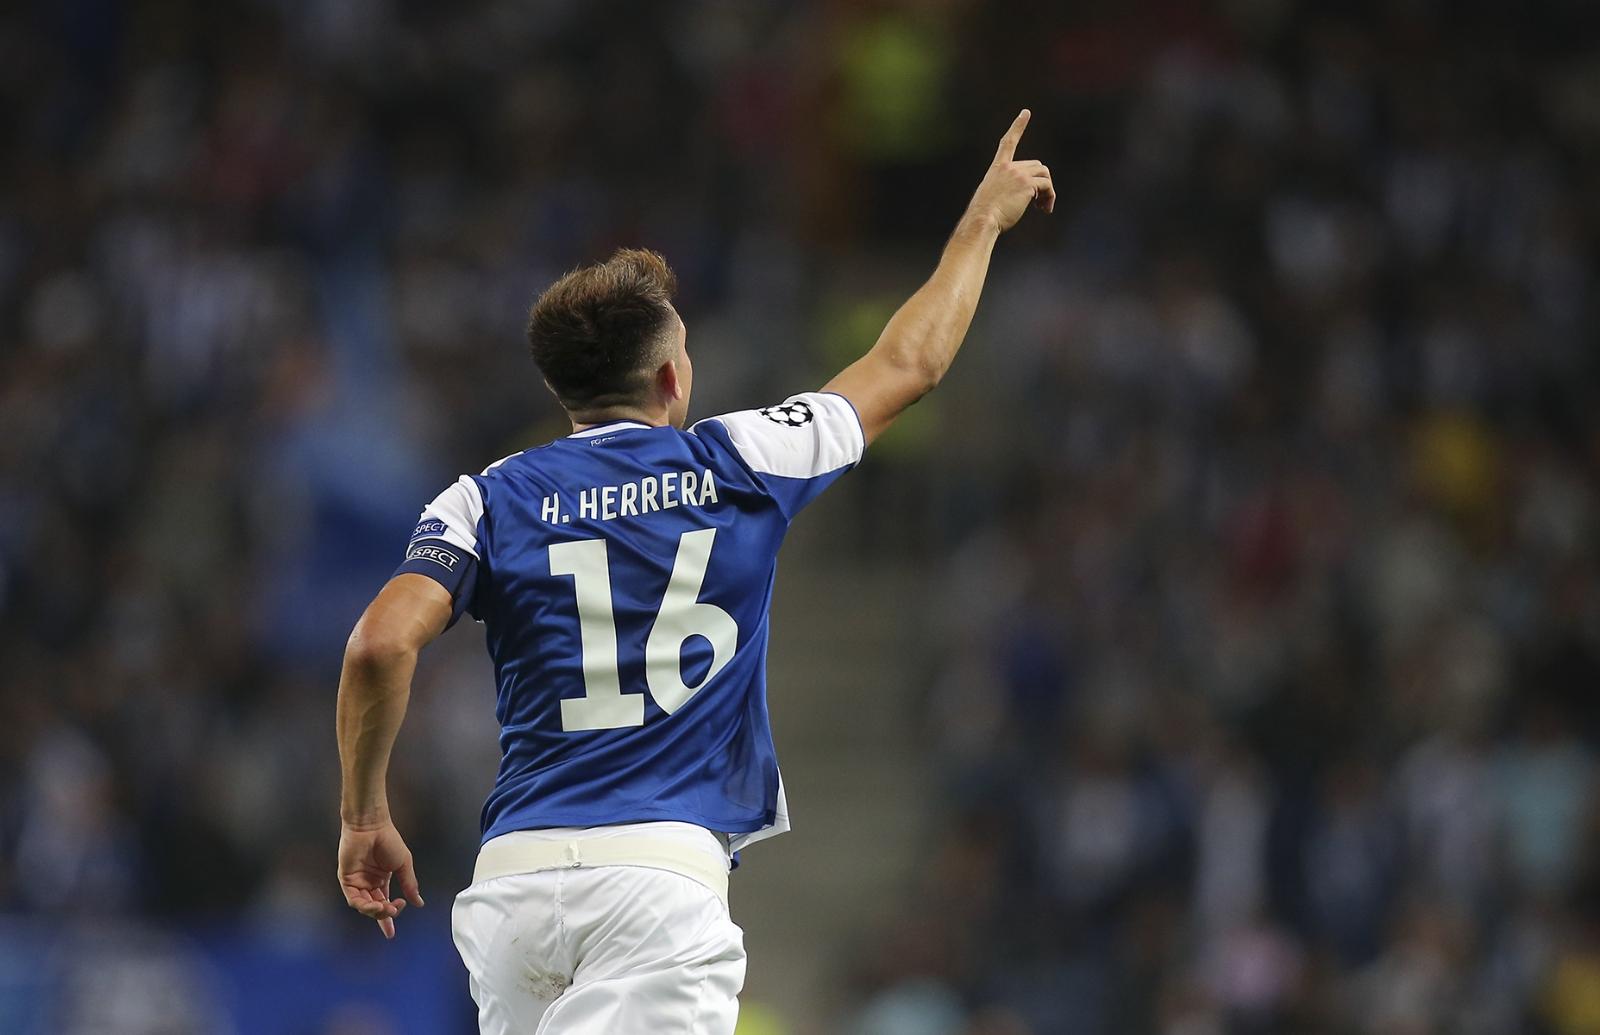 Herrera anota y otorga victoria al Porto